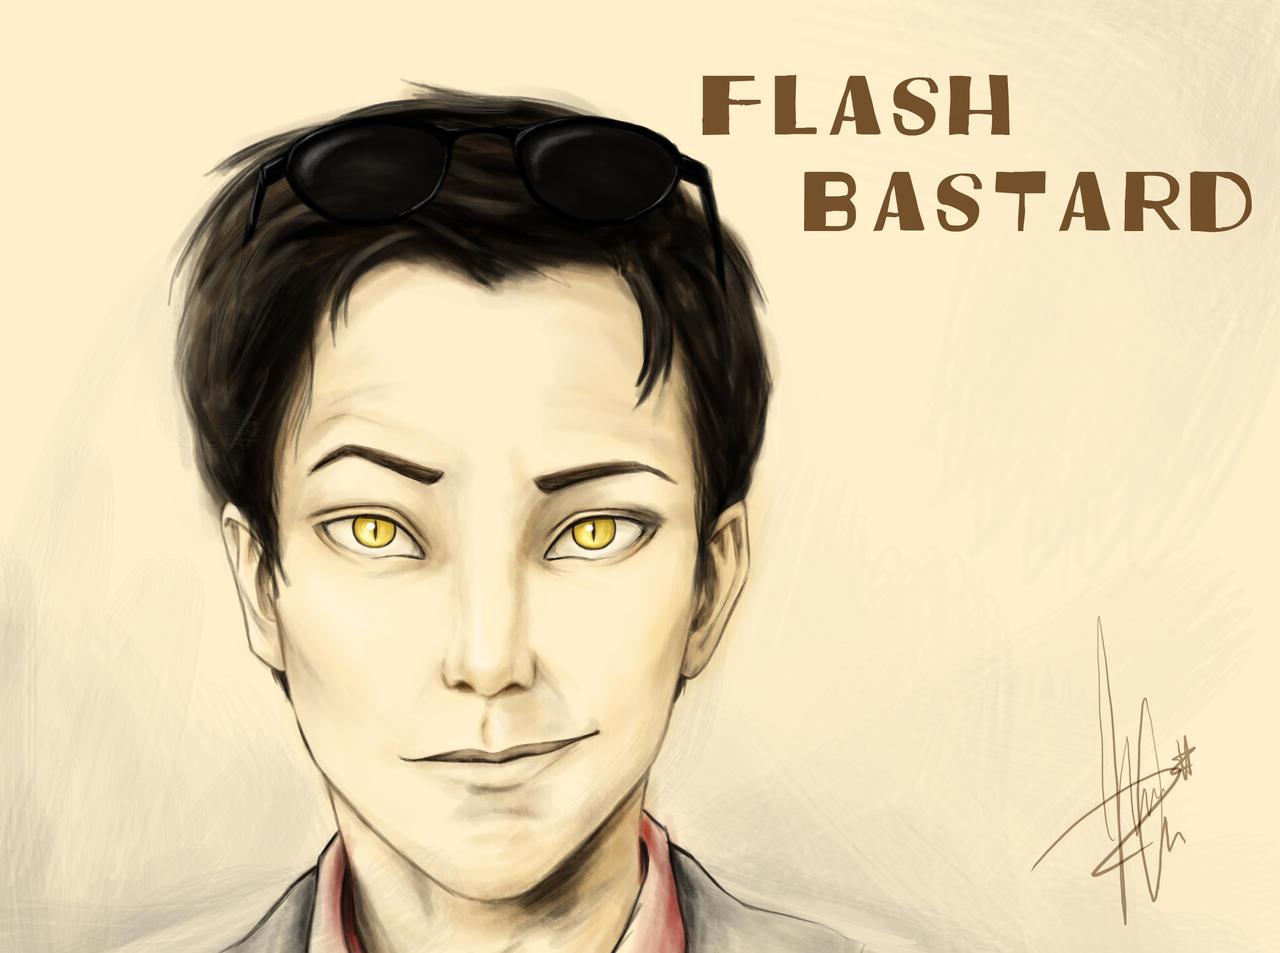 Flash Bastard by TwilightSadist